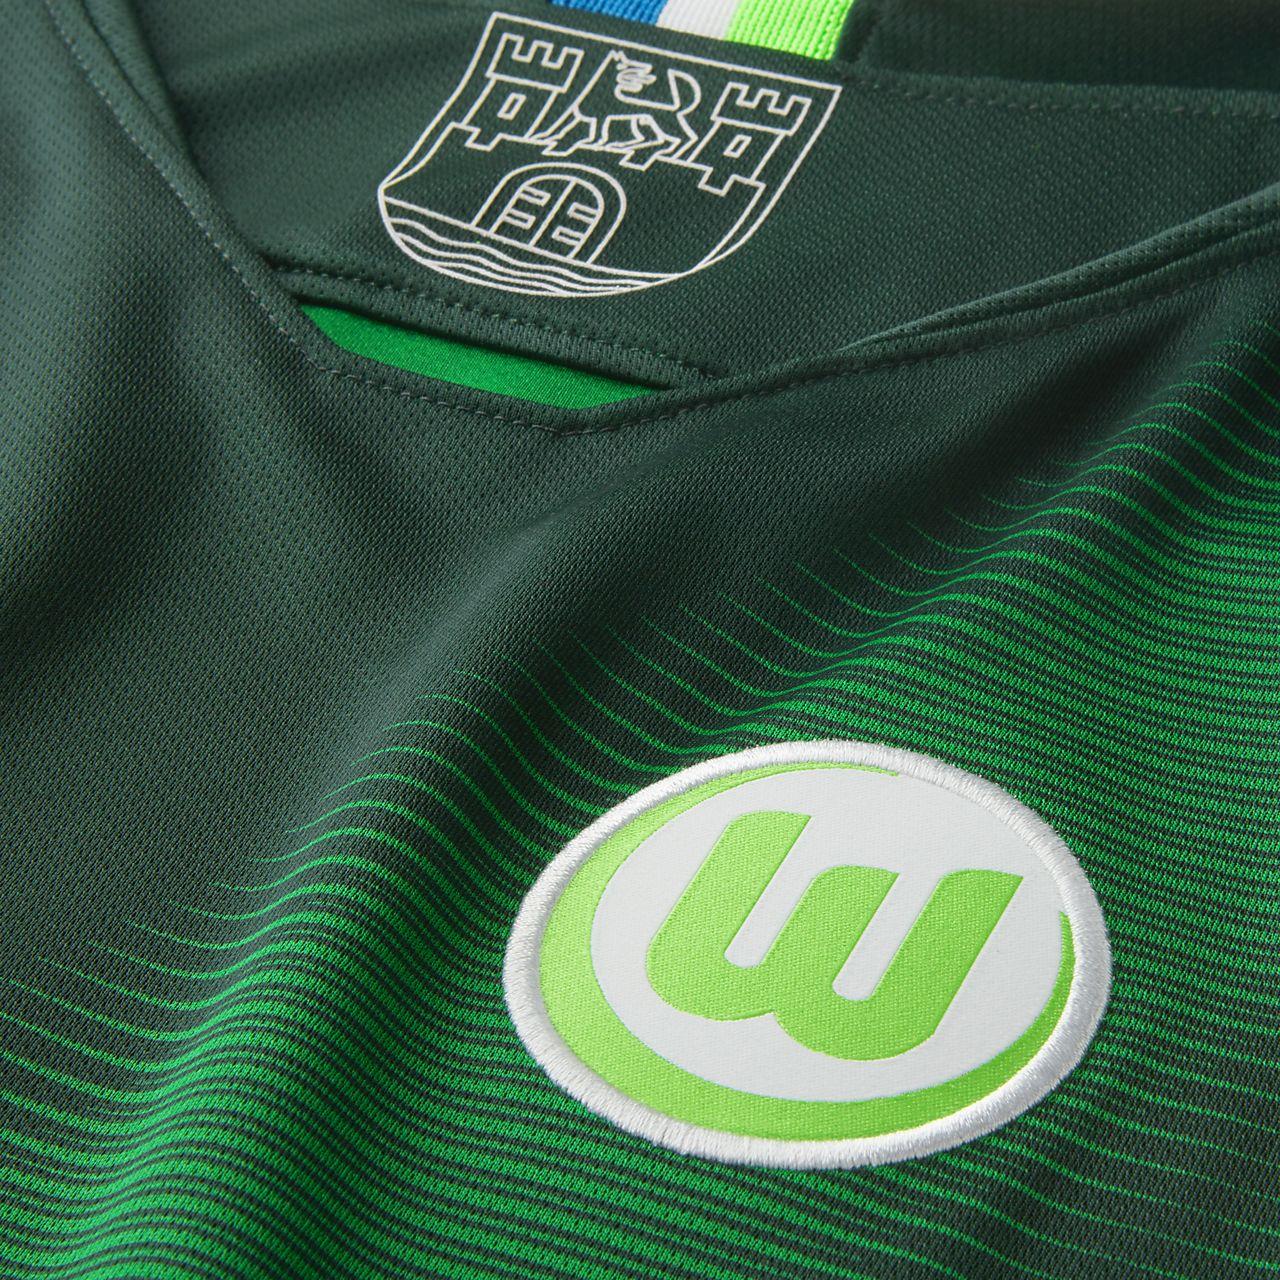 865564139f Camisola de futebol 2018 19 VfL Wolfsburg Stadium Home Júnior. Nike ...